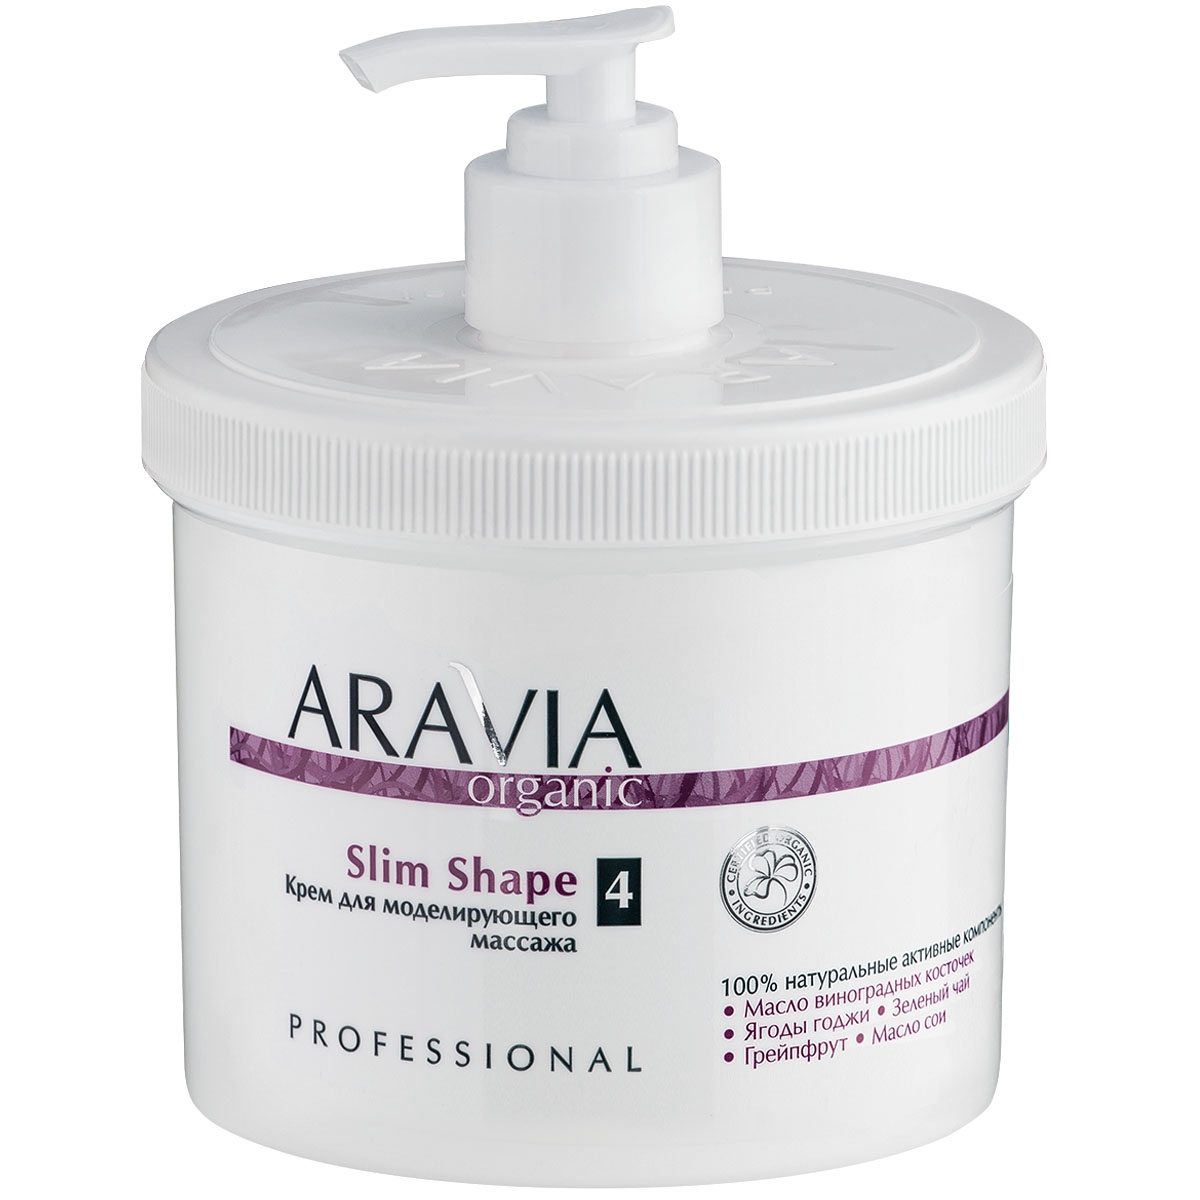 ARAVIA ARAVIA Organic Крем для Моделирующего Массажа «Slim Shape», 550 мл крем для моделирующего масссажа aravia professional organic slim shape 550 мл